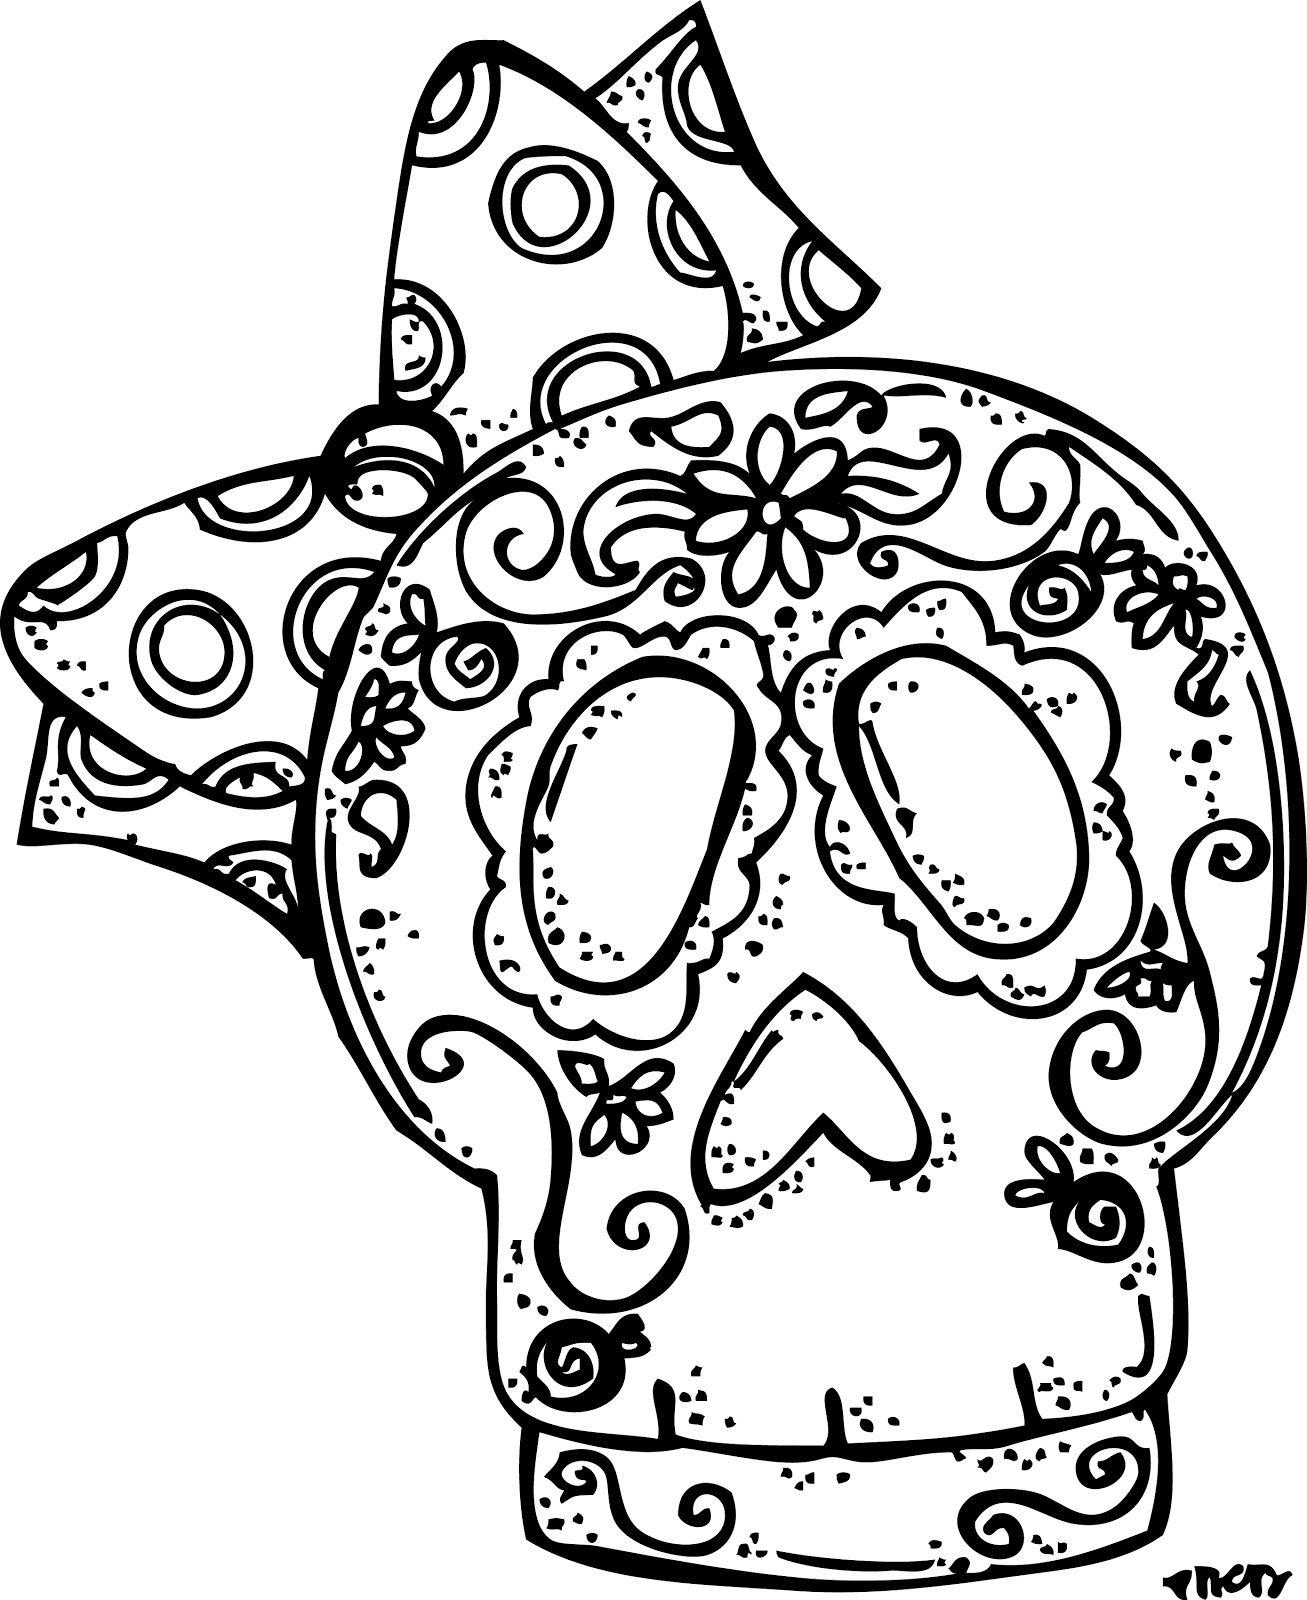 Happy Dia de los Muertos! | Day of the Dead/ Skulls | Pinterest ...